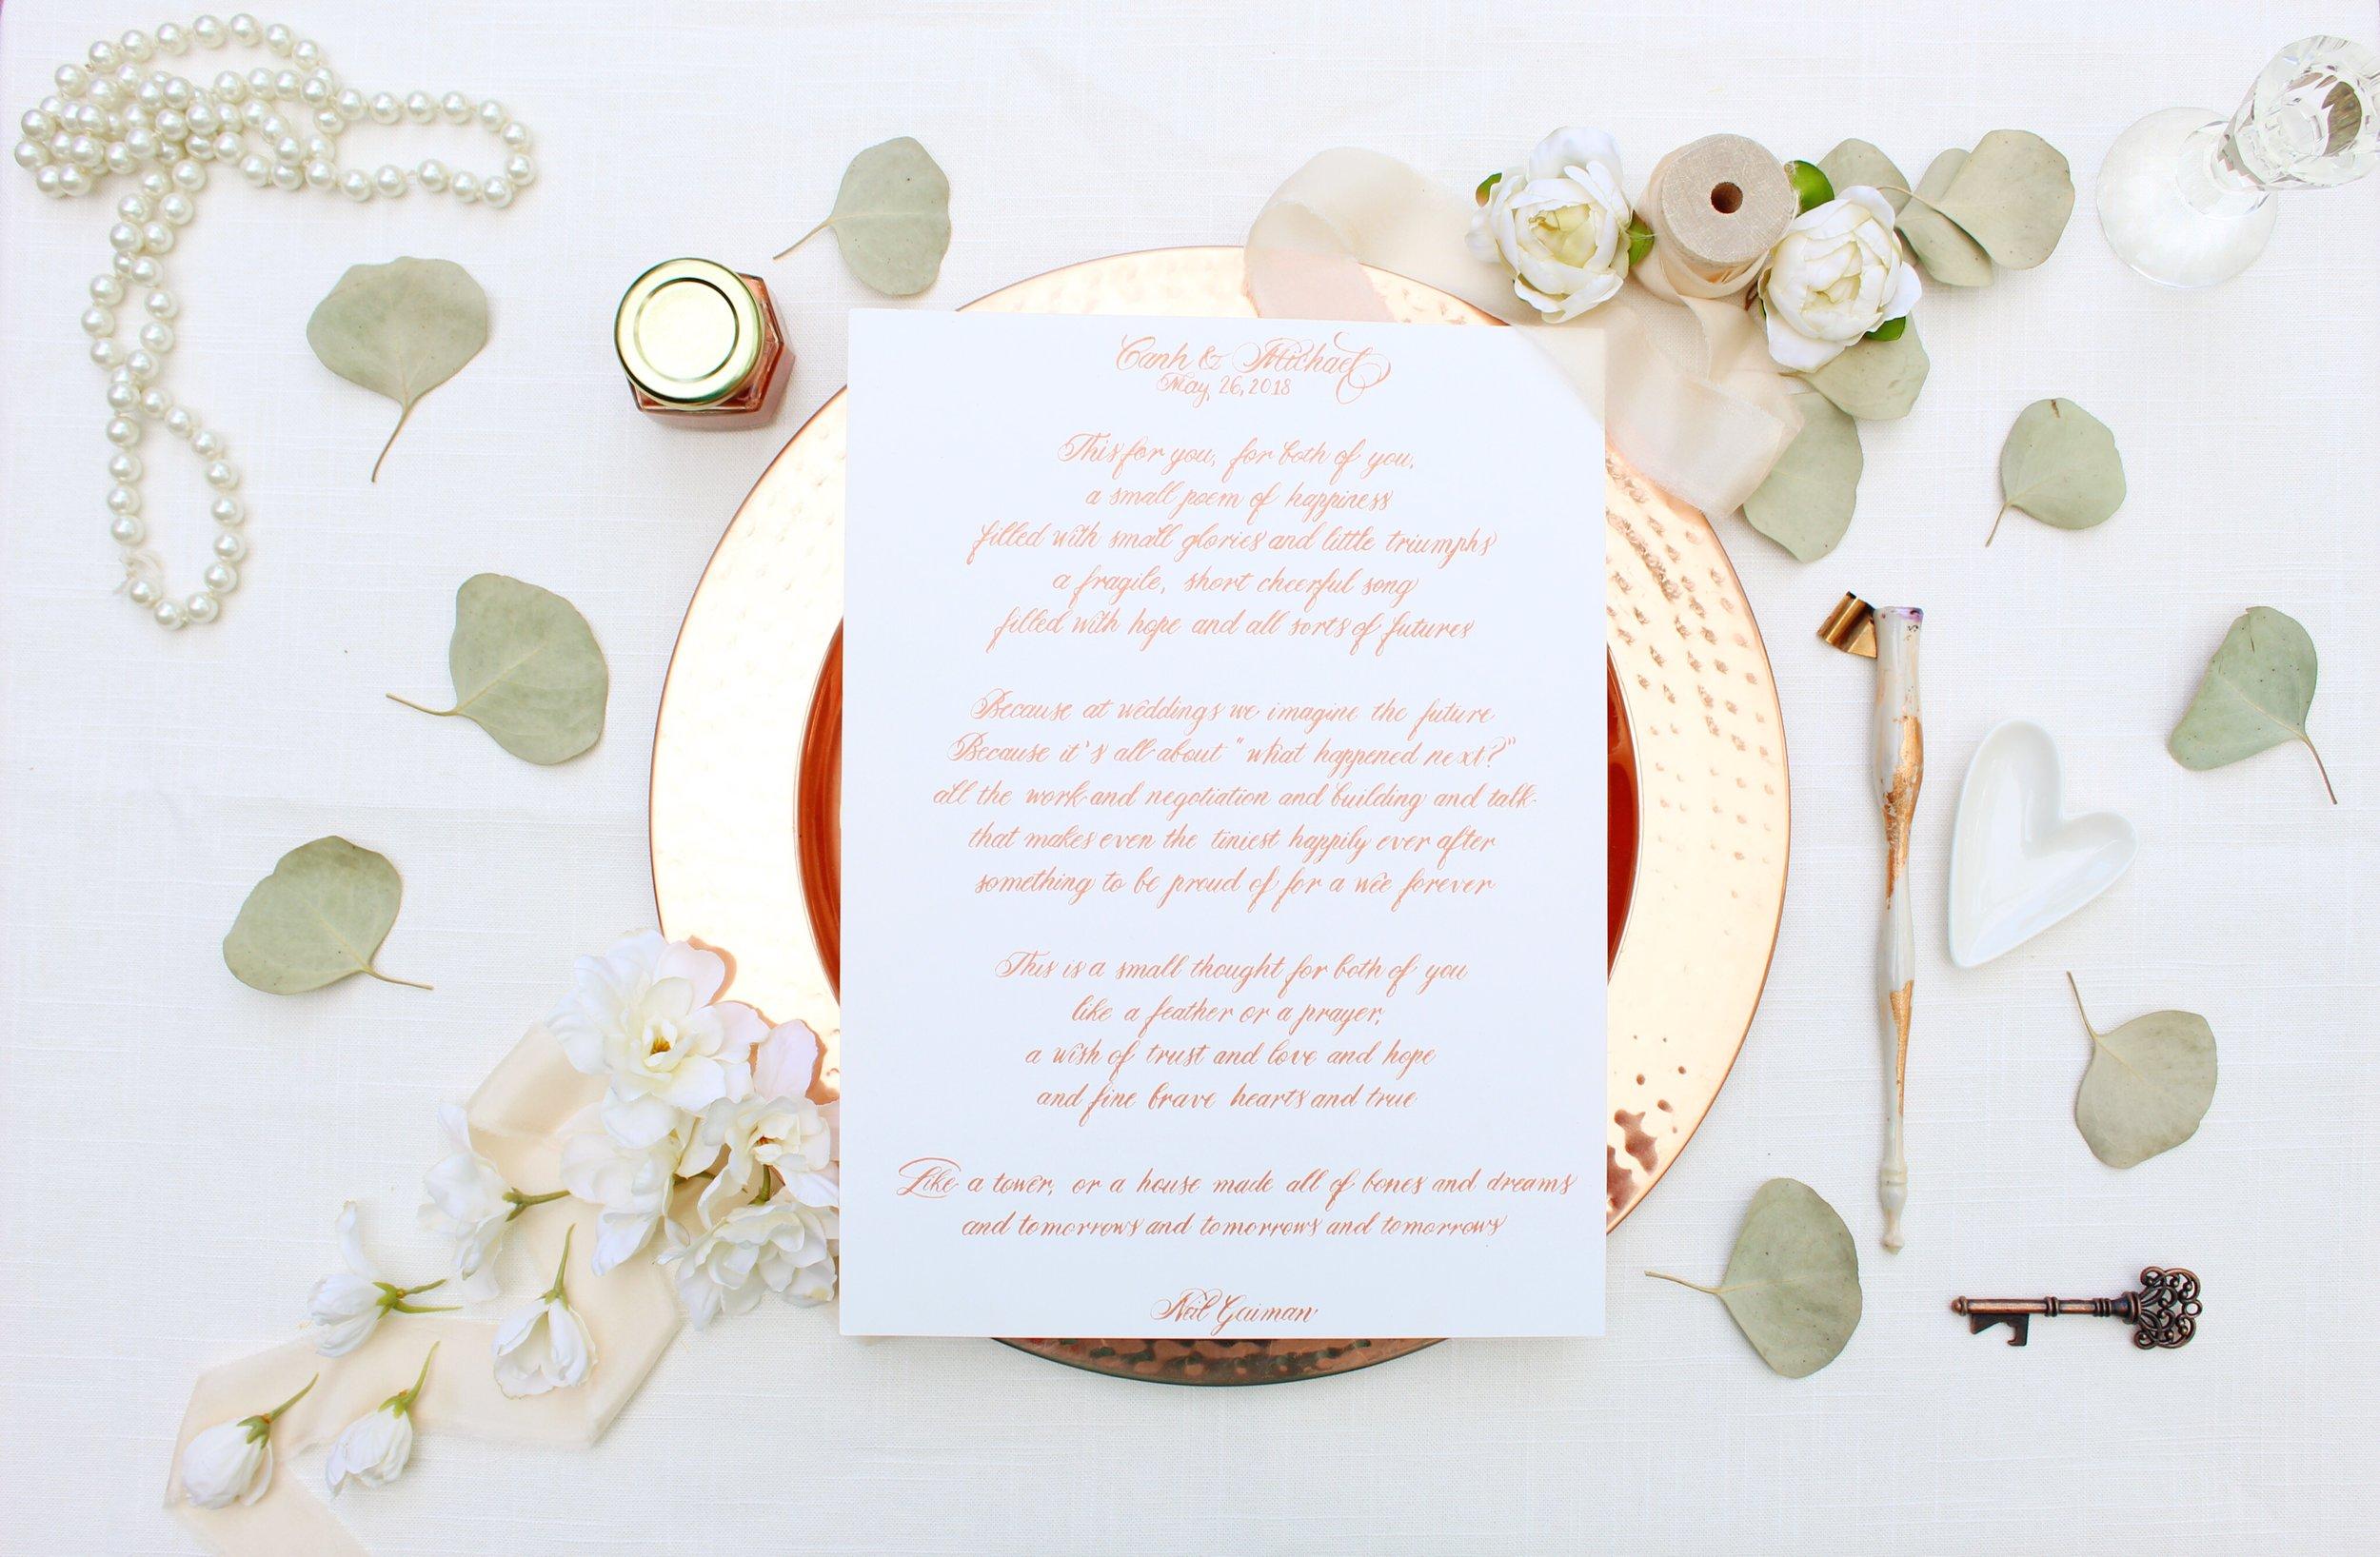 Central PA, York PA, JesSmith Designs, custom, wedding, invitations, bridal, announcements, save the date, baby, hanover, calligraphy, baltimore, wedding invitations, lancaster, gettysburg-05-11 17.15.11.jpg